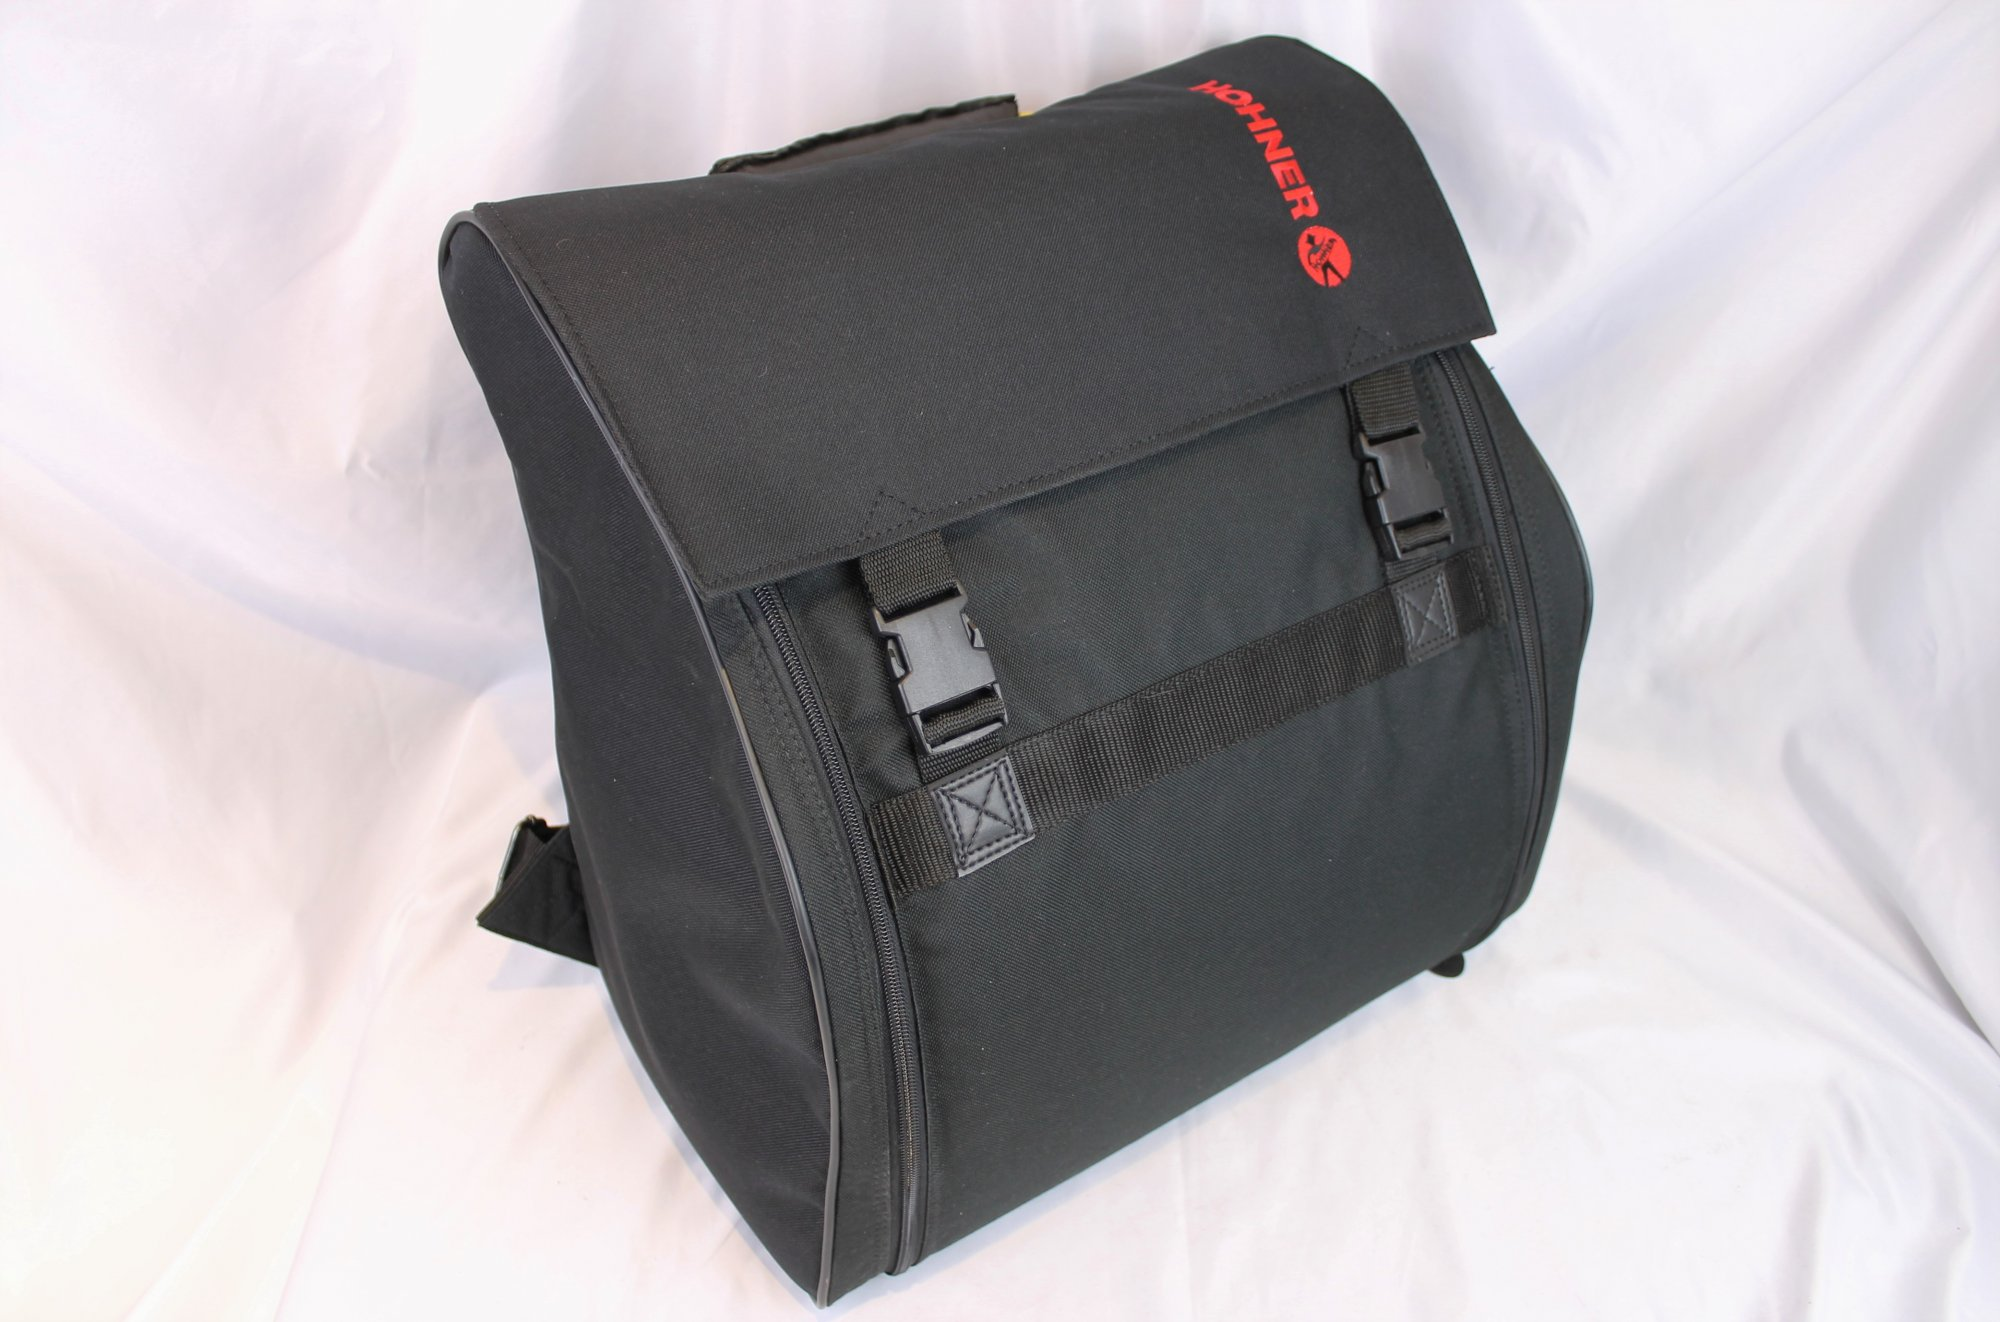 NEW Black Hohner Rockbag Soft Case for Accordion 14 x 7 x 14 Fits 12, 24, 32, 48 Bass Accordions